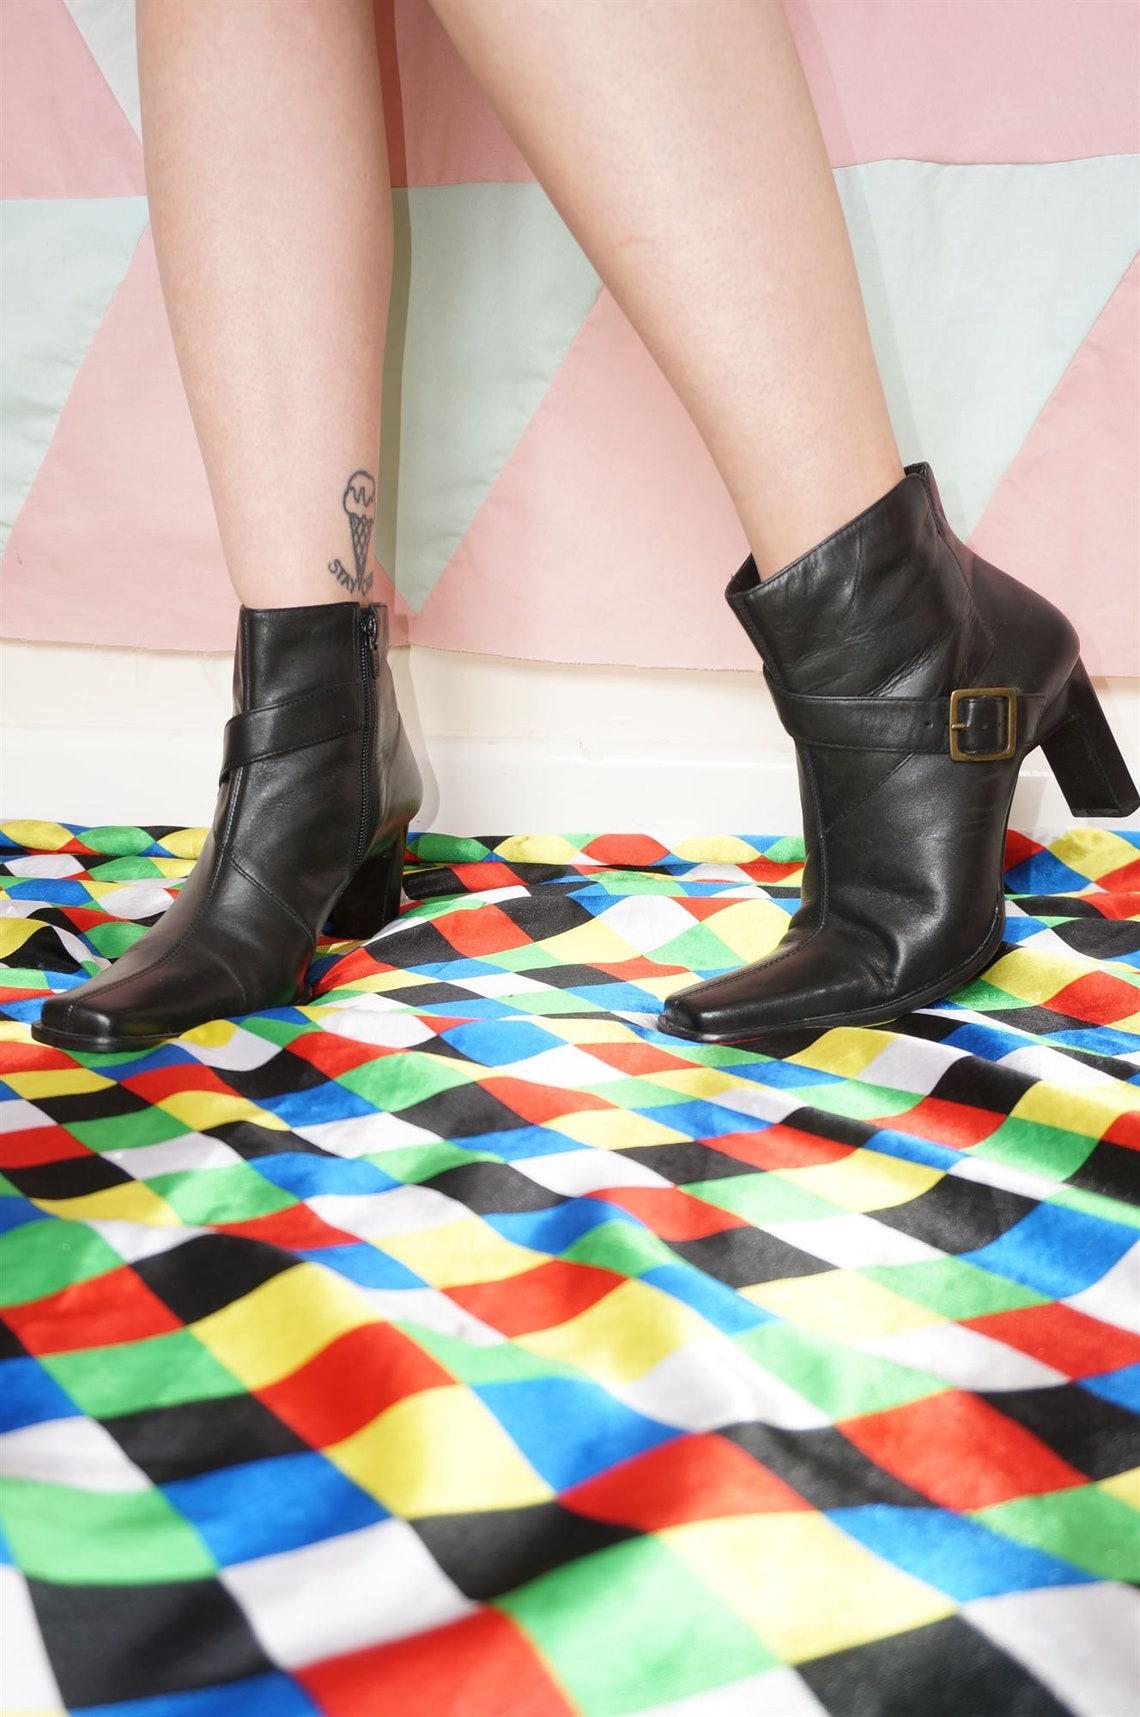 Vintage 90s Black Leather Gold Buckle High Heel Ankle Boots - Big Sale 67pkz